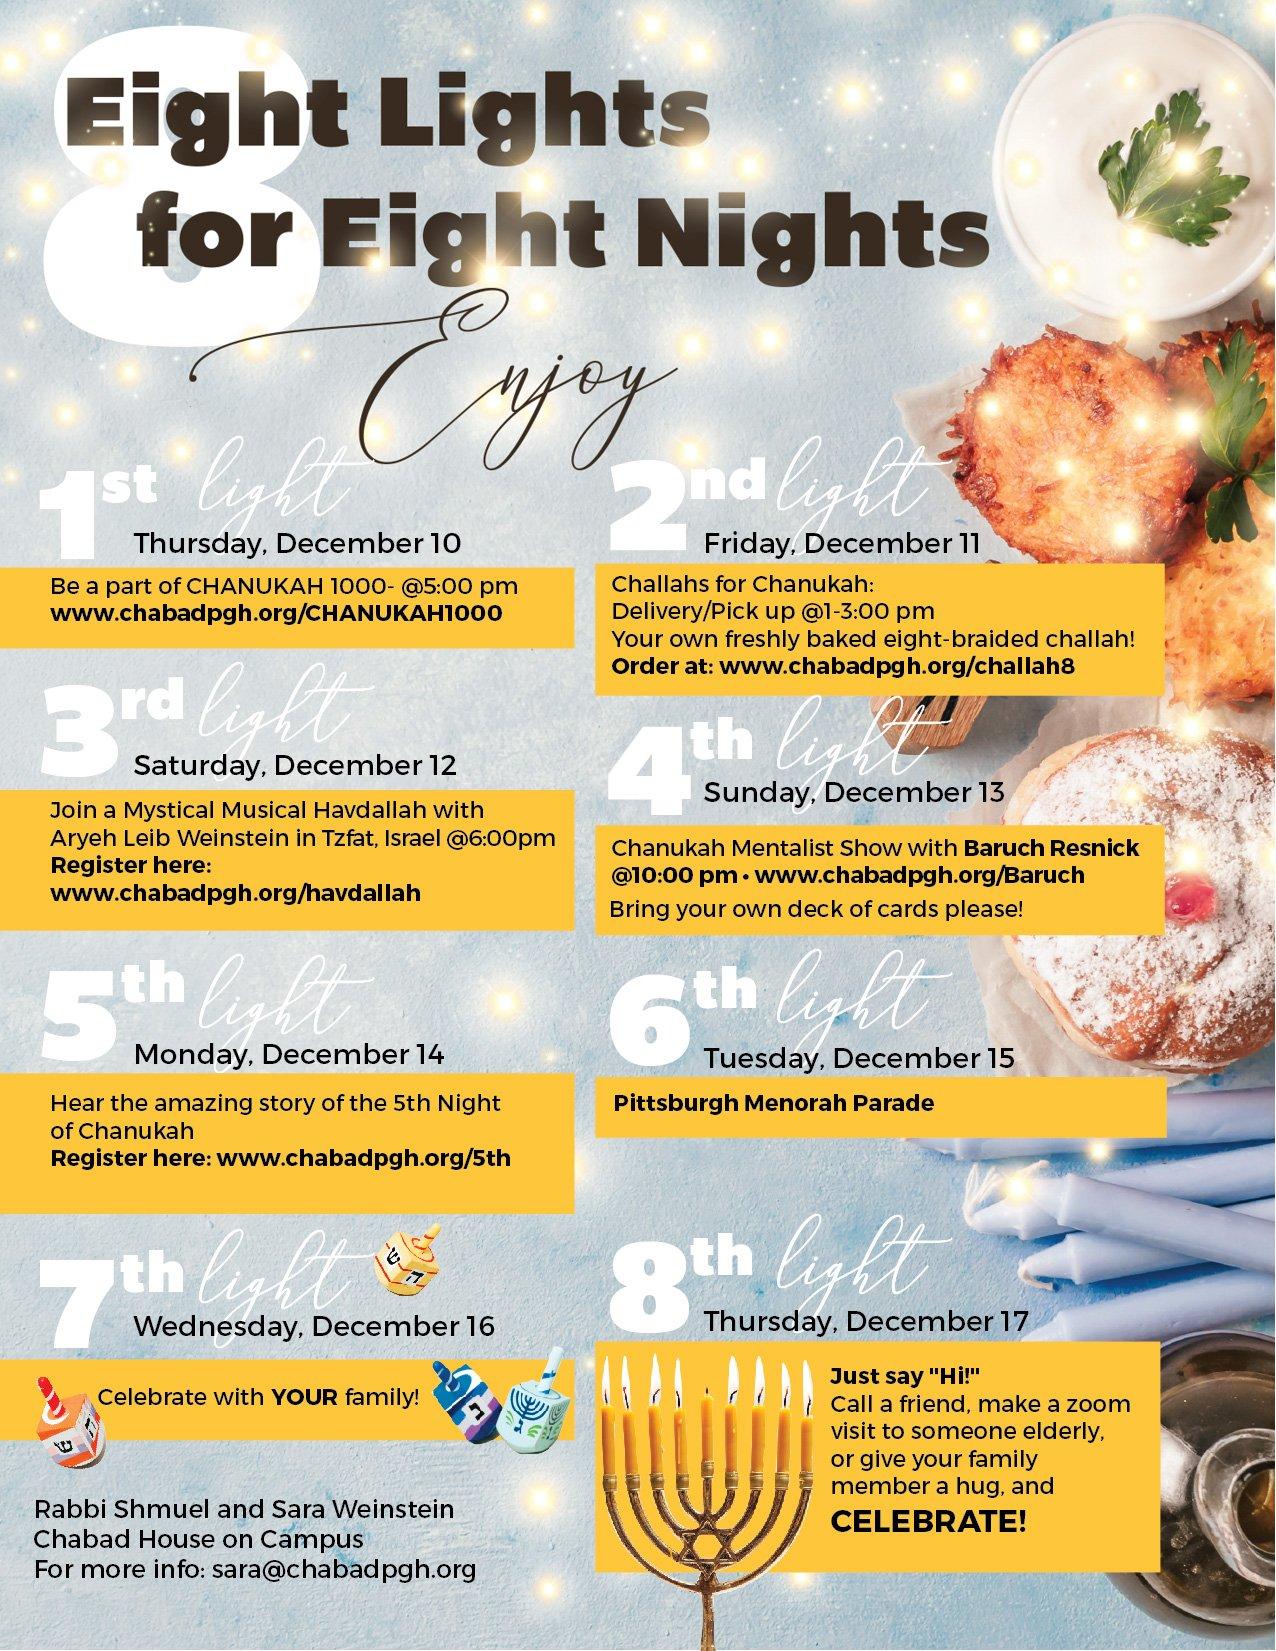 EIGHT LIGHTS flyer.jpg